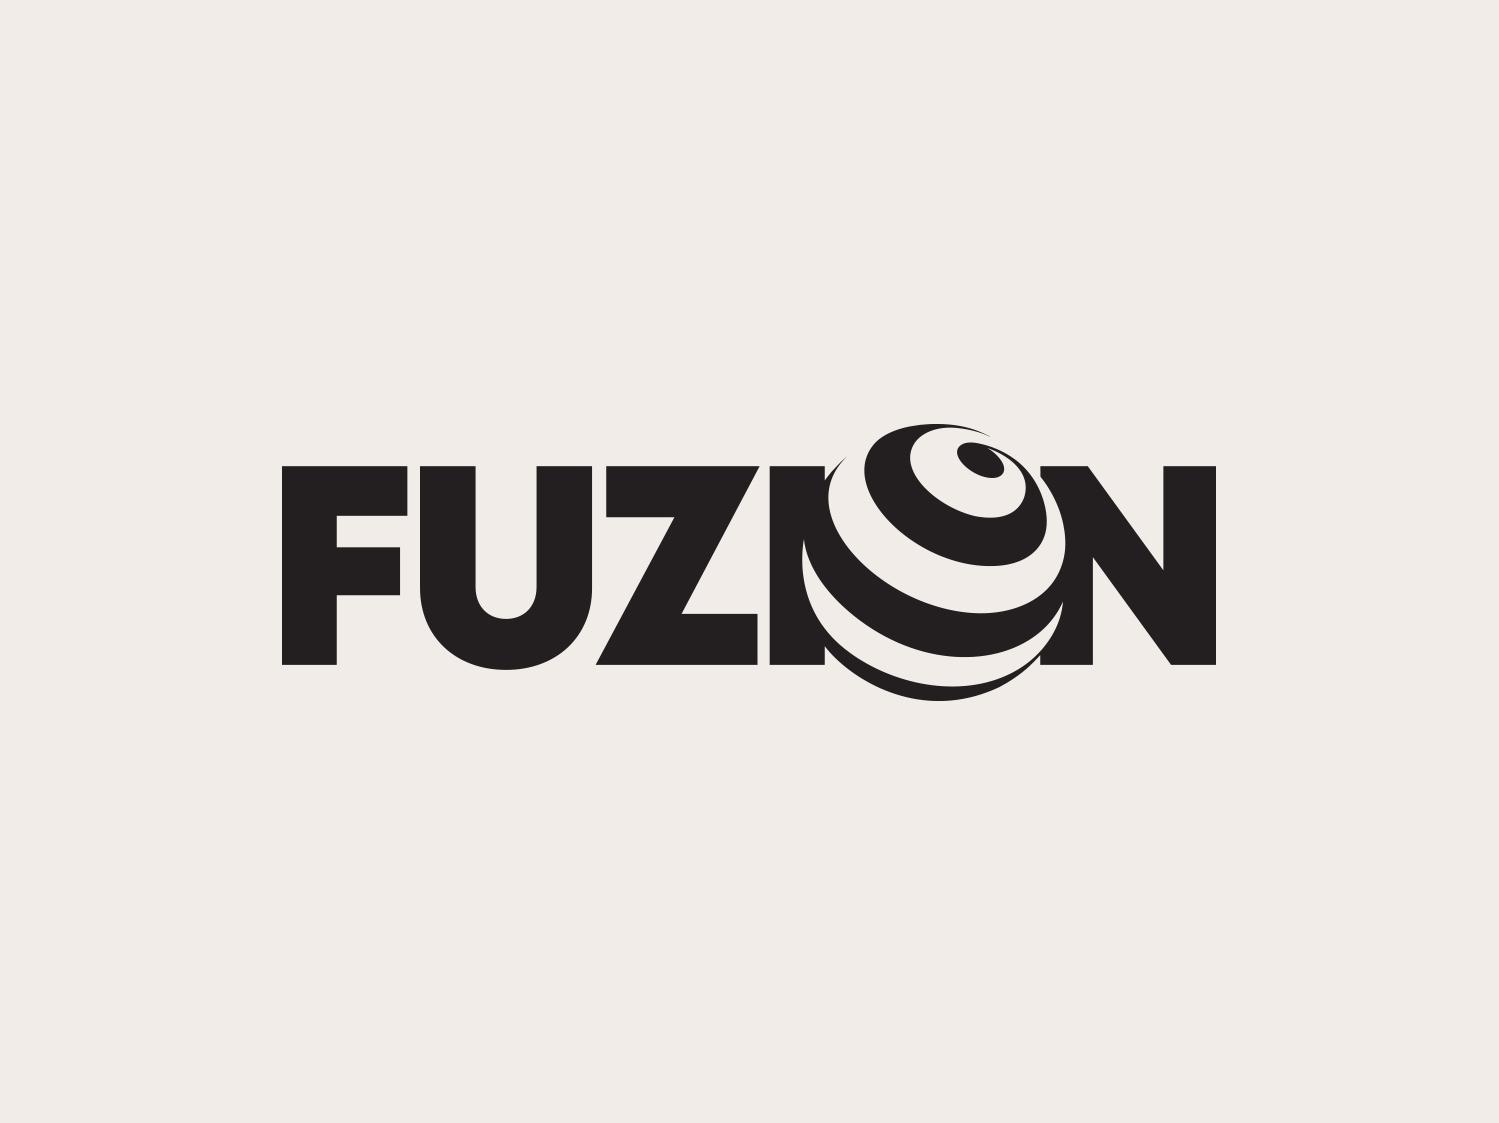 Fuzion Logo Design by Aditya | Logo Designer on Dribbble